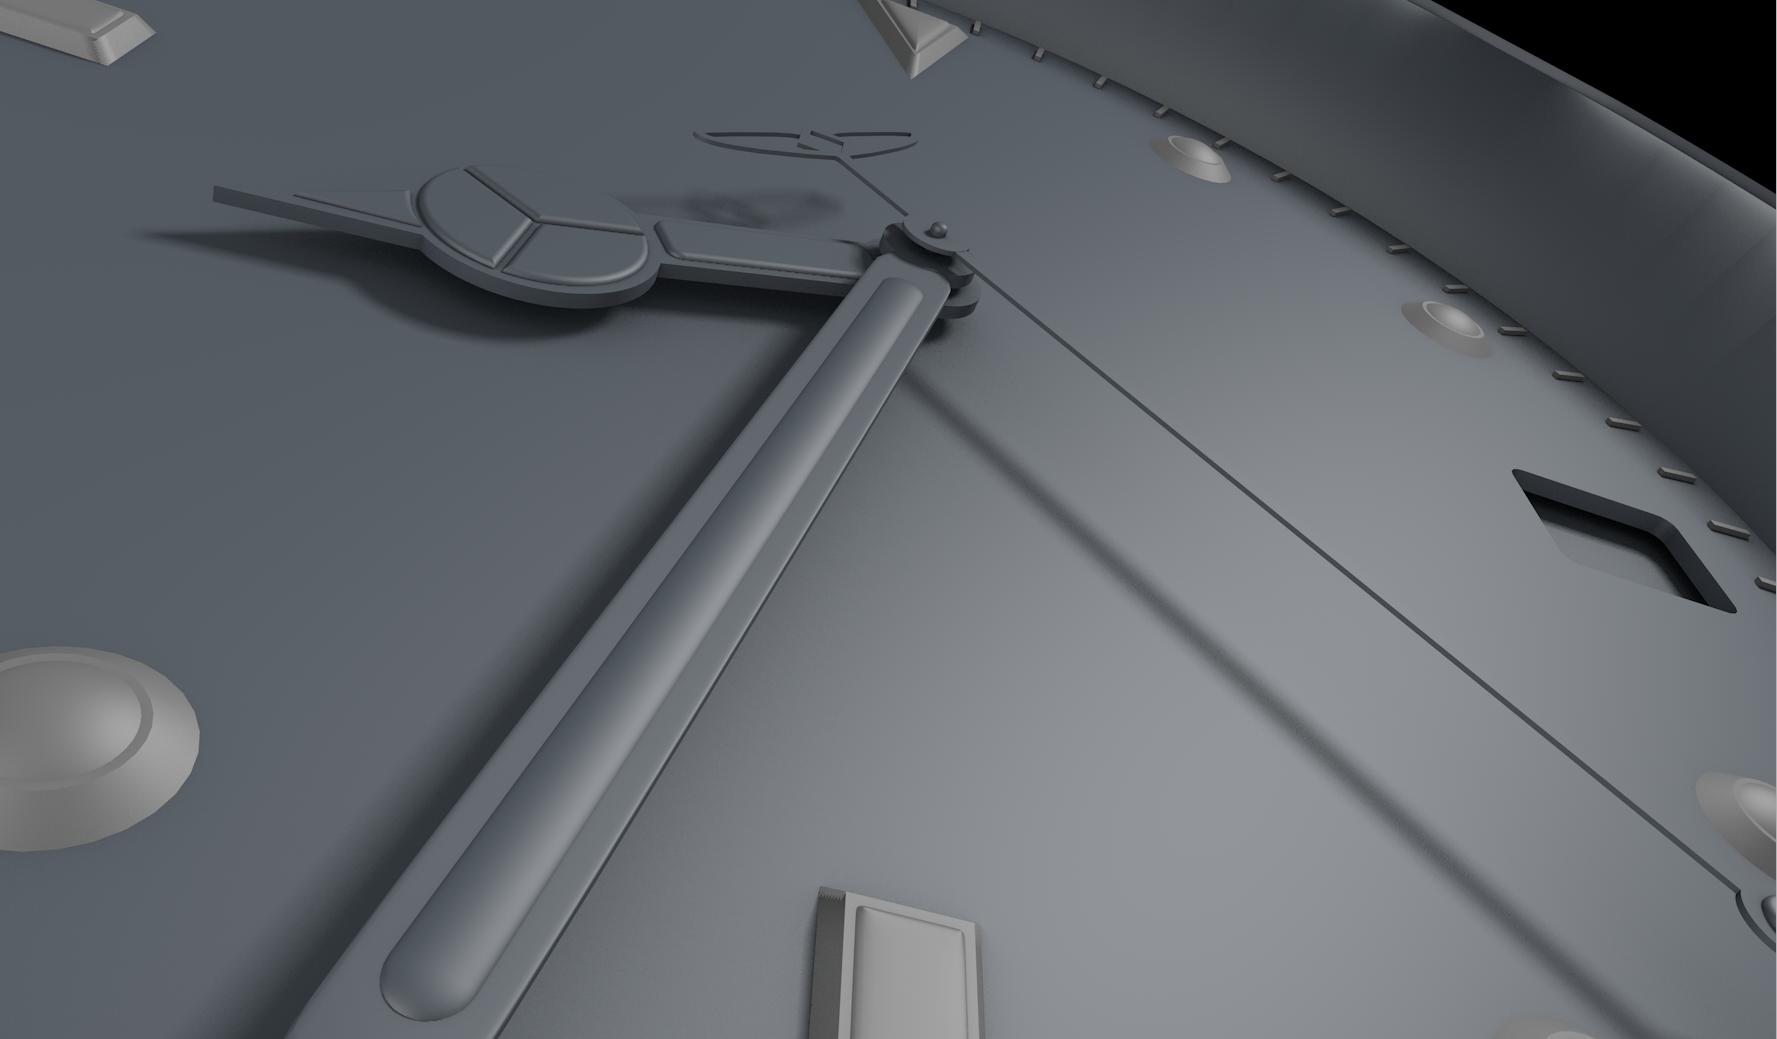 Screenshot in the process